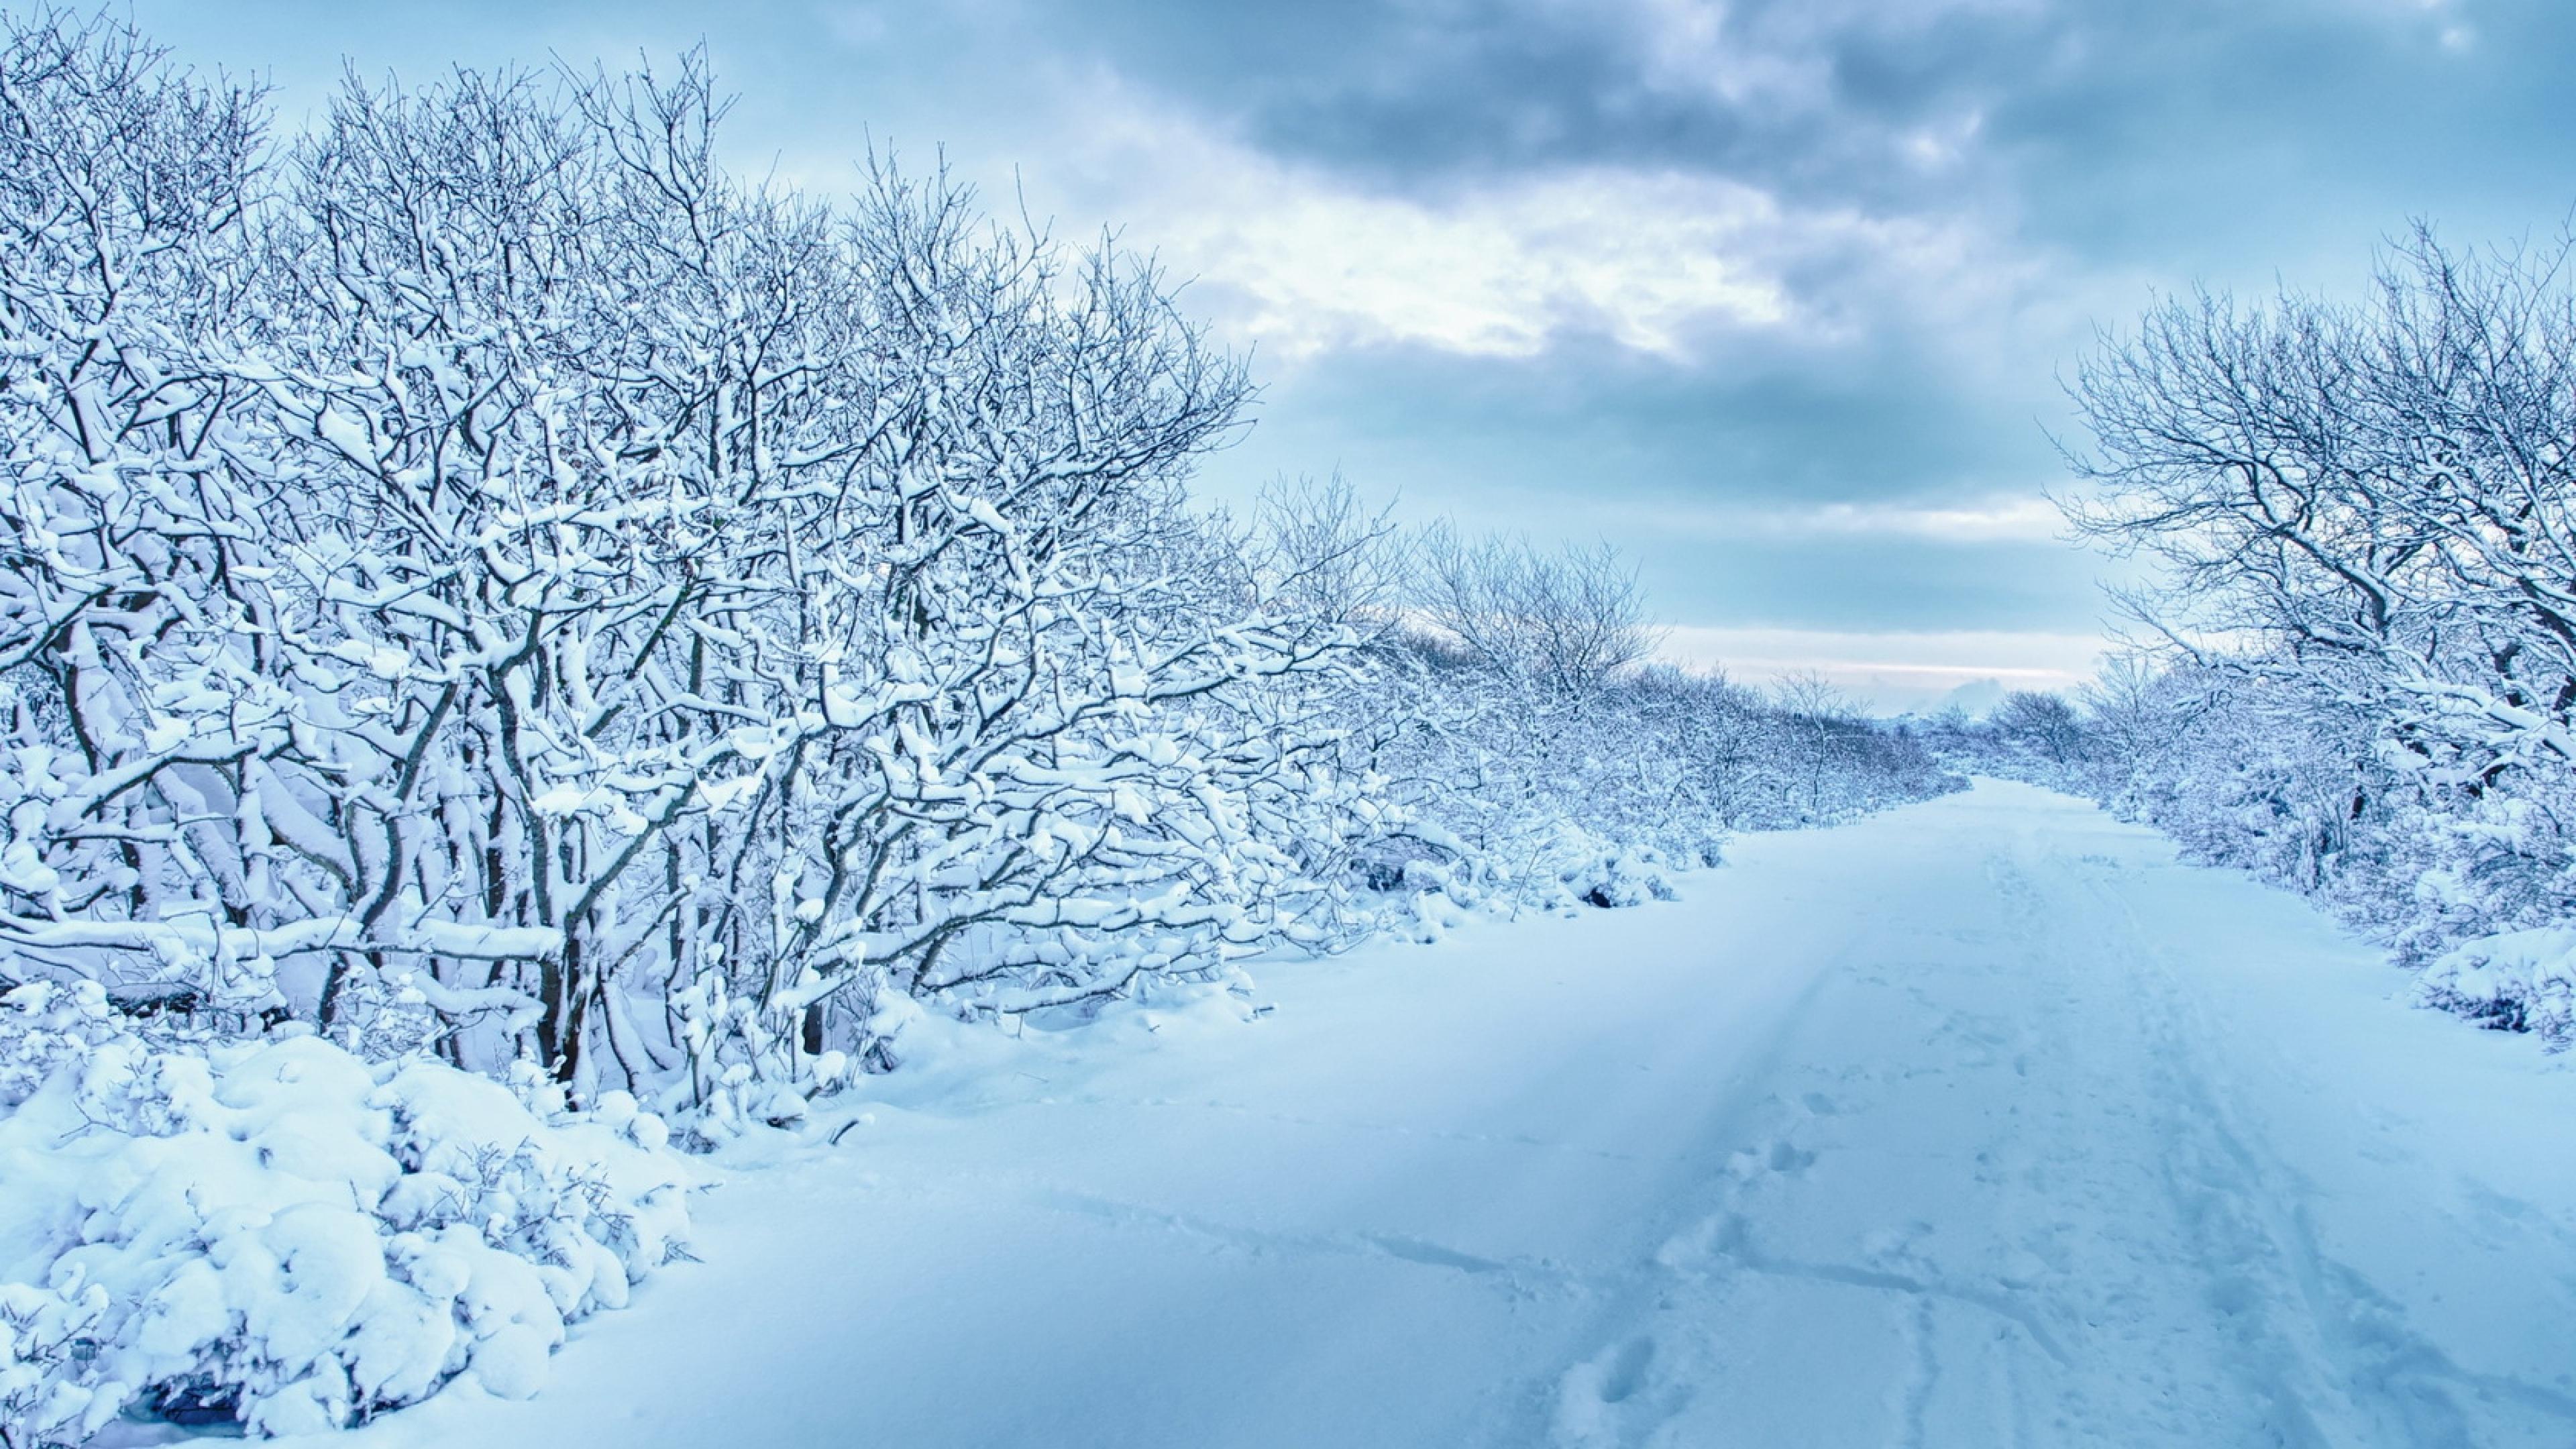 snowfall wallpaper desktop 1080p - photo #10